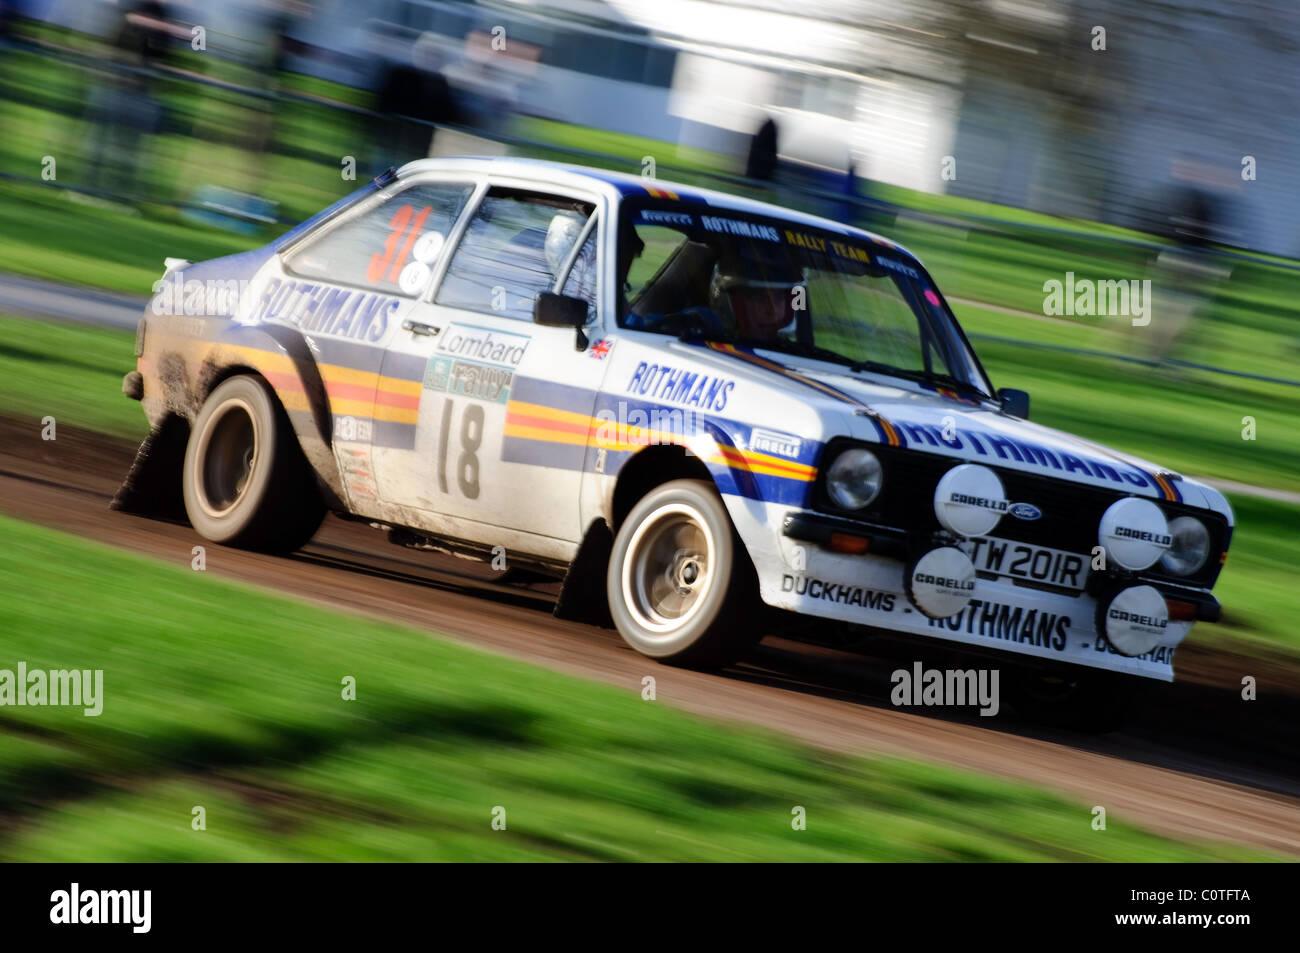 1981 Ford Escort MKII, Alan Watkins - Race retro, Stoneleigh Park - Stock Image